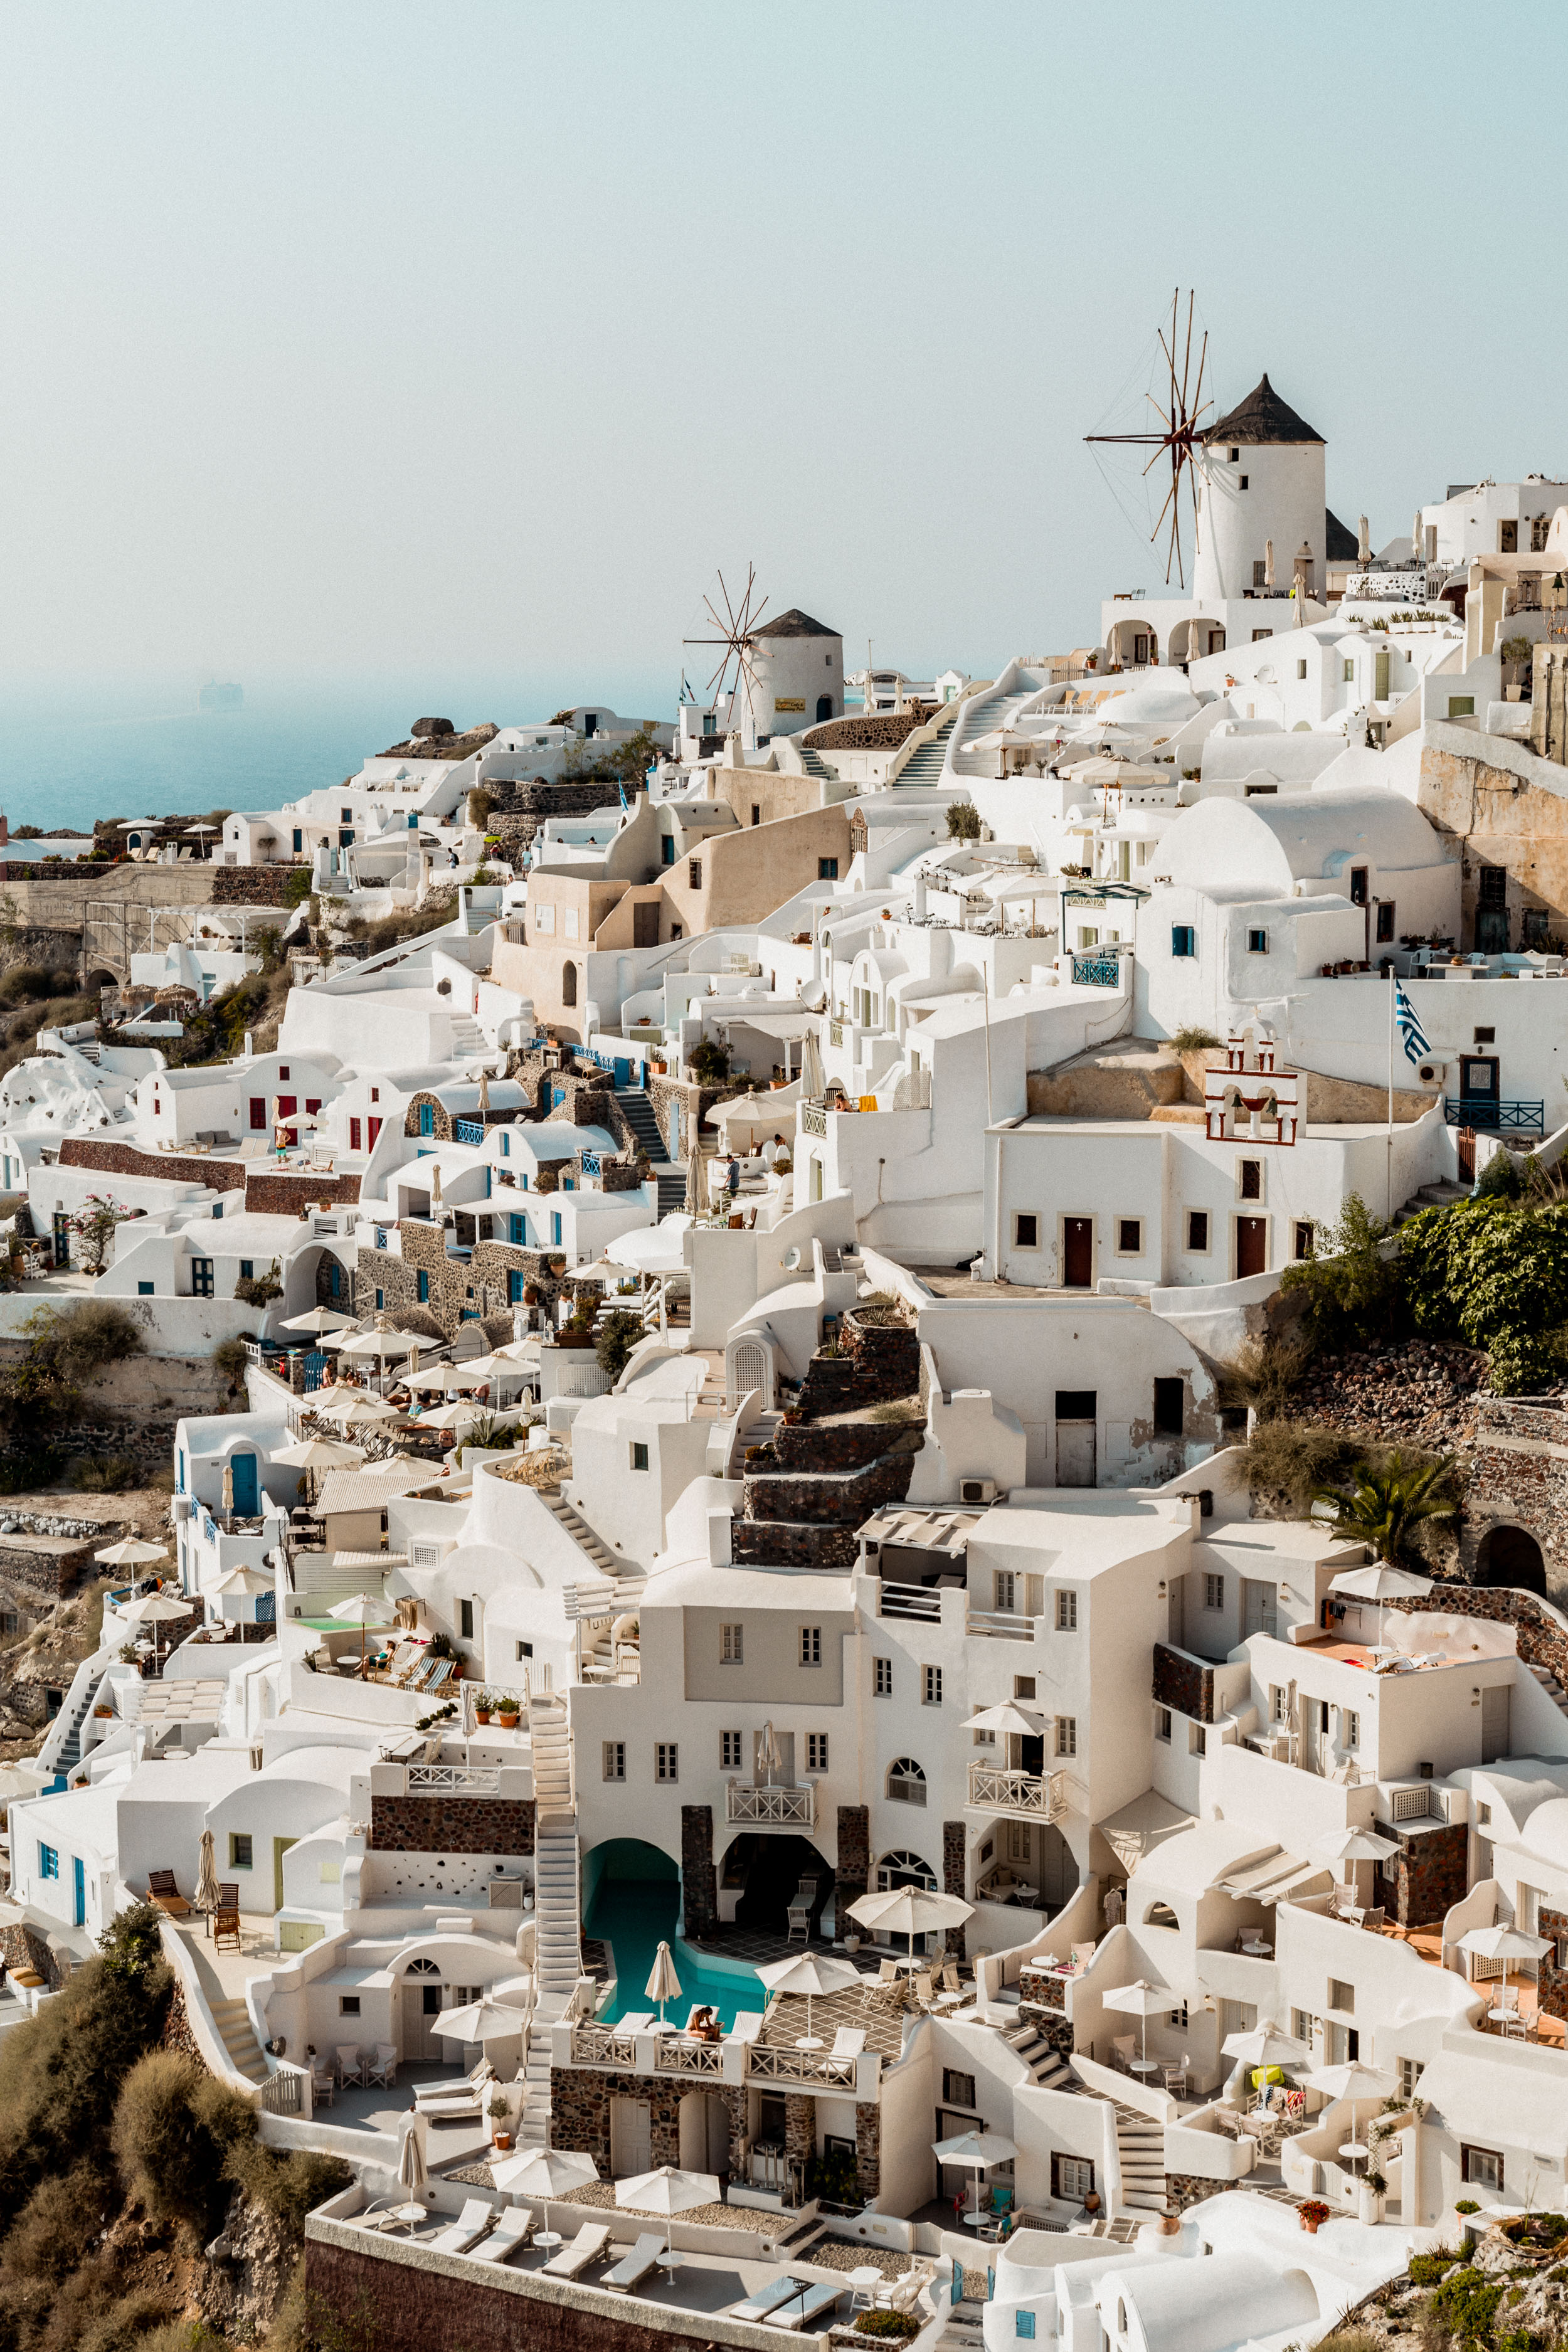 32-santorini-ia-oia-greece-cyclades-travel-anna-elina-lahti-photographer.jpg